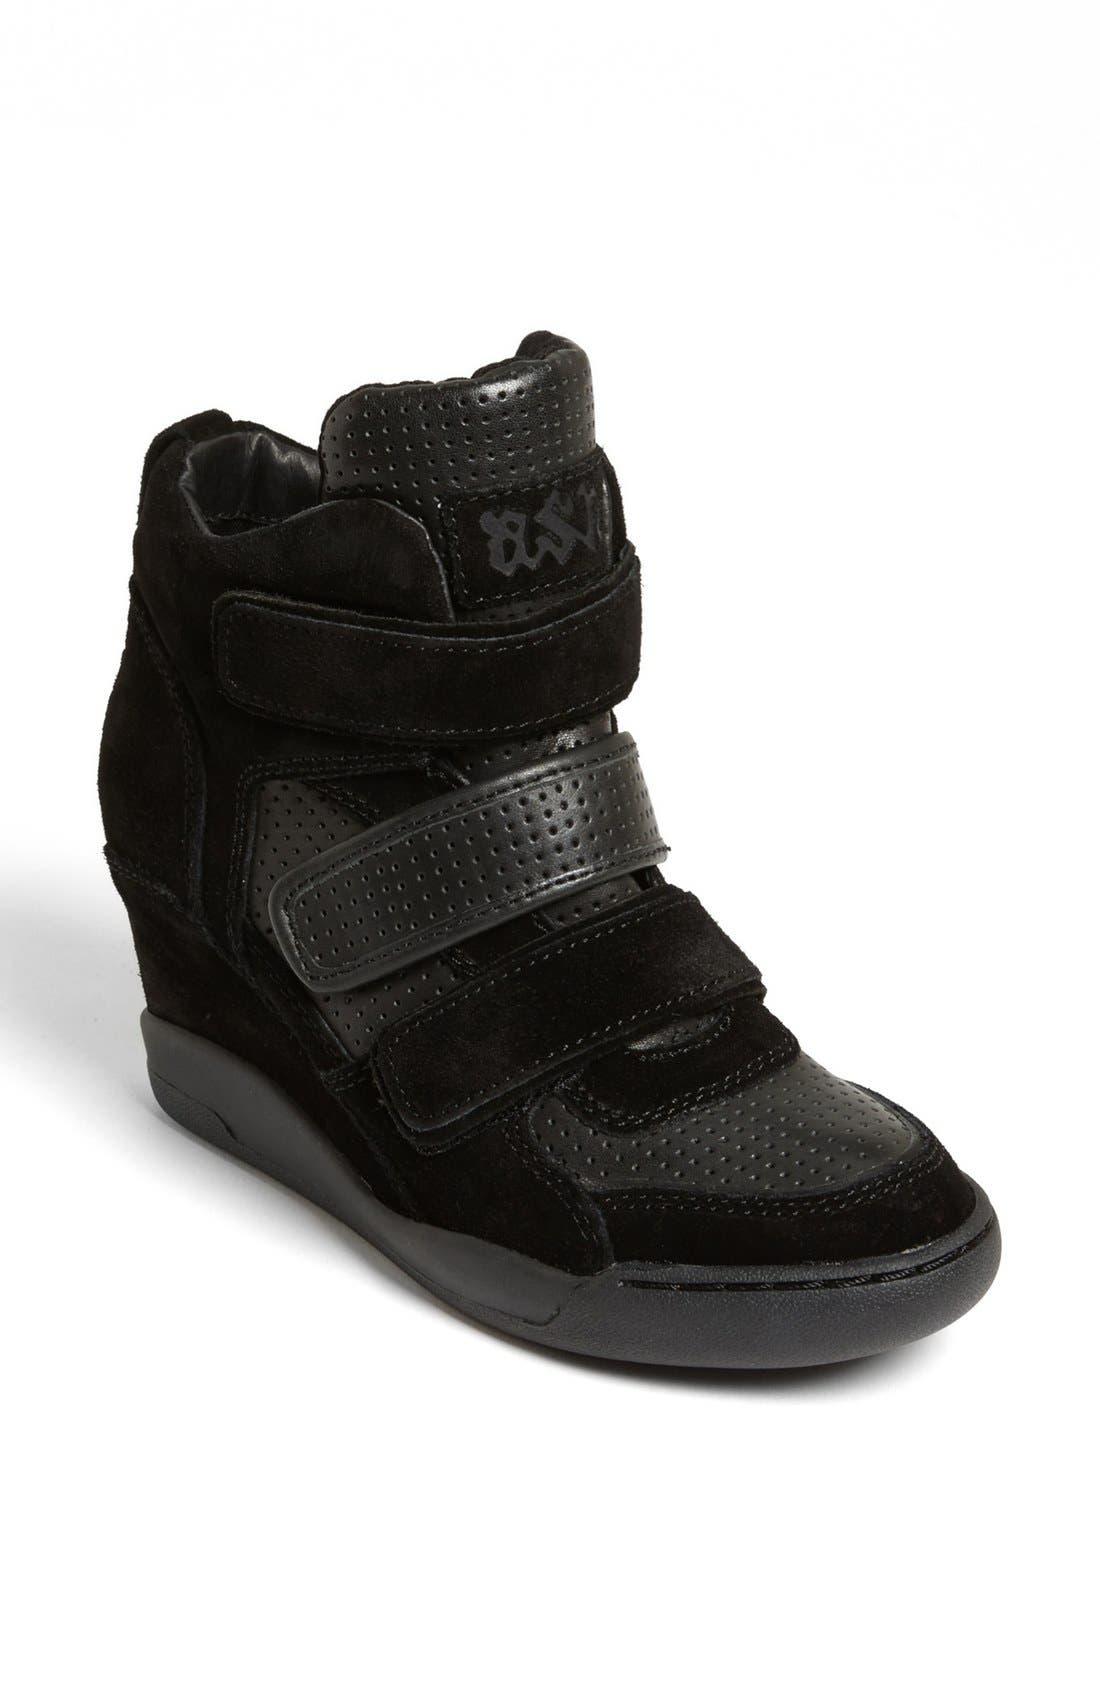 Alternate Image 1 Selected - Ash 'Alex' Sneaker